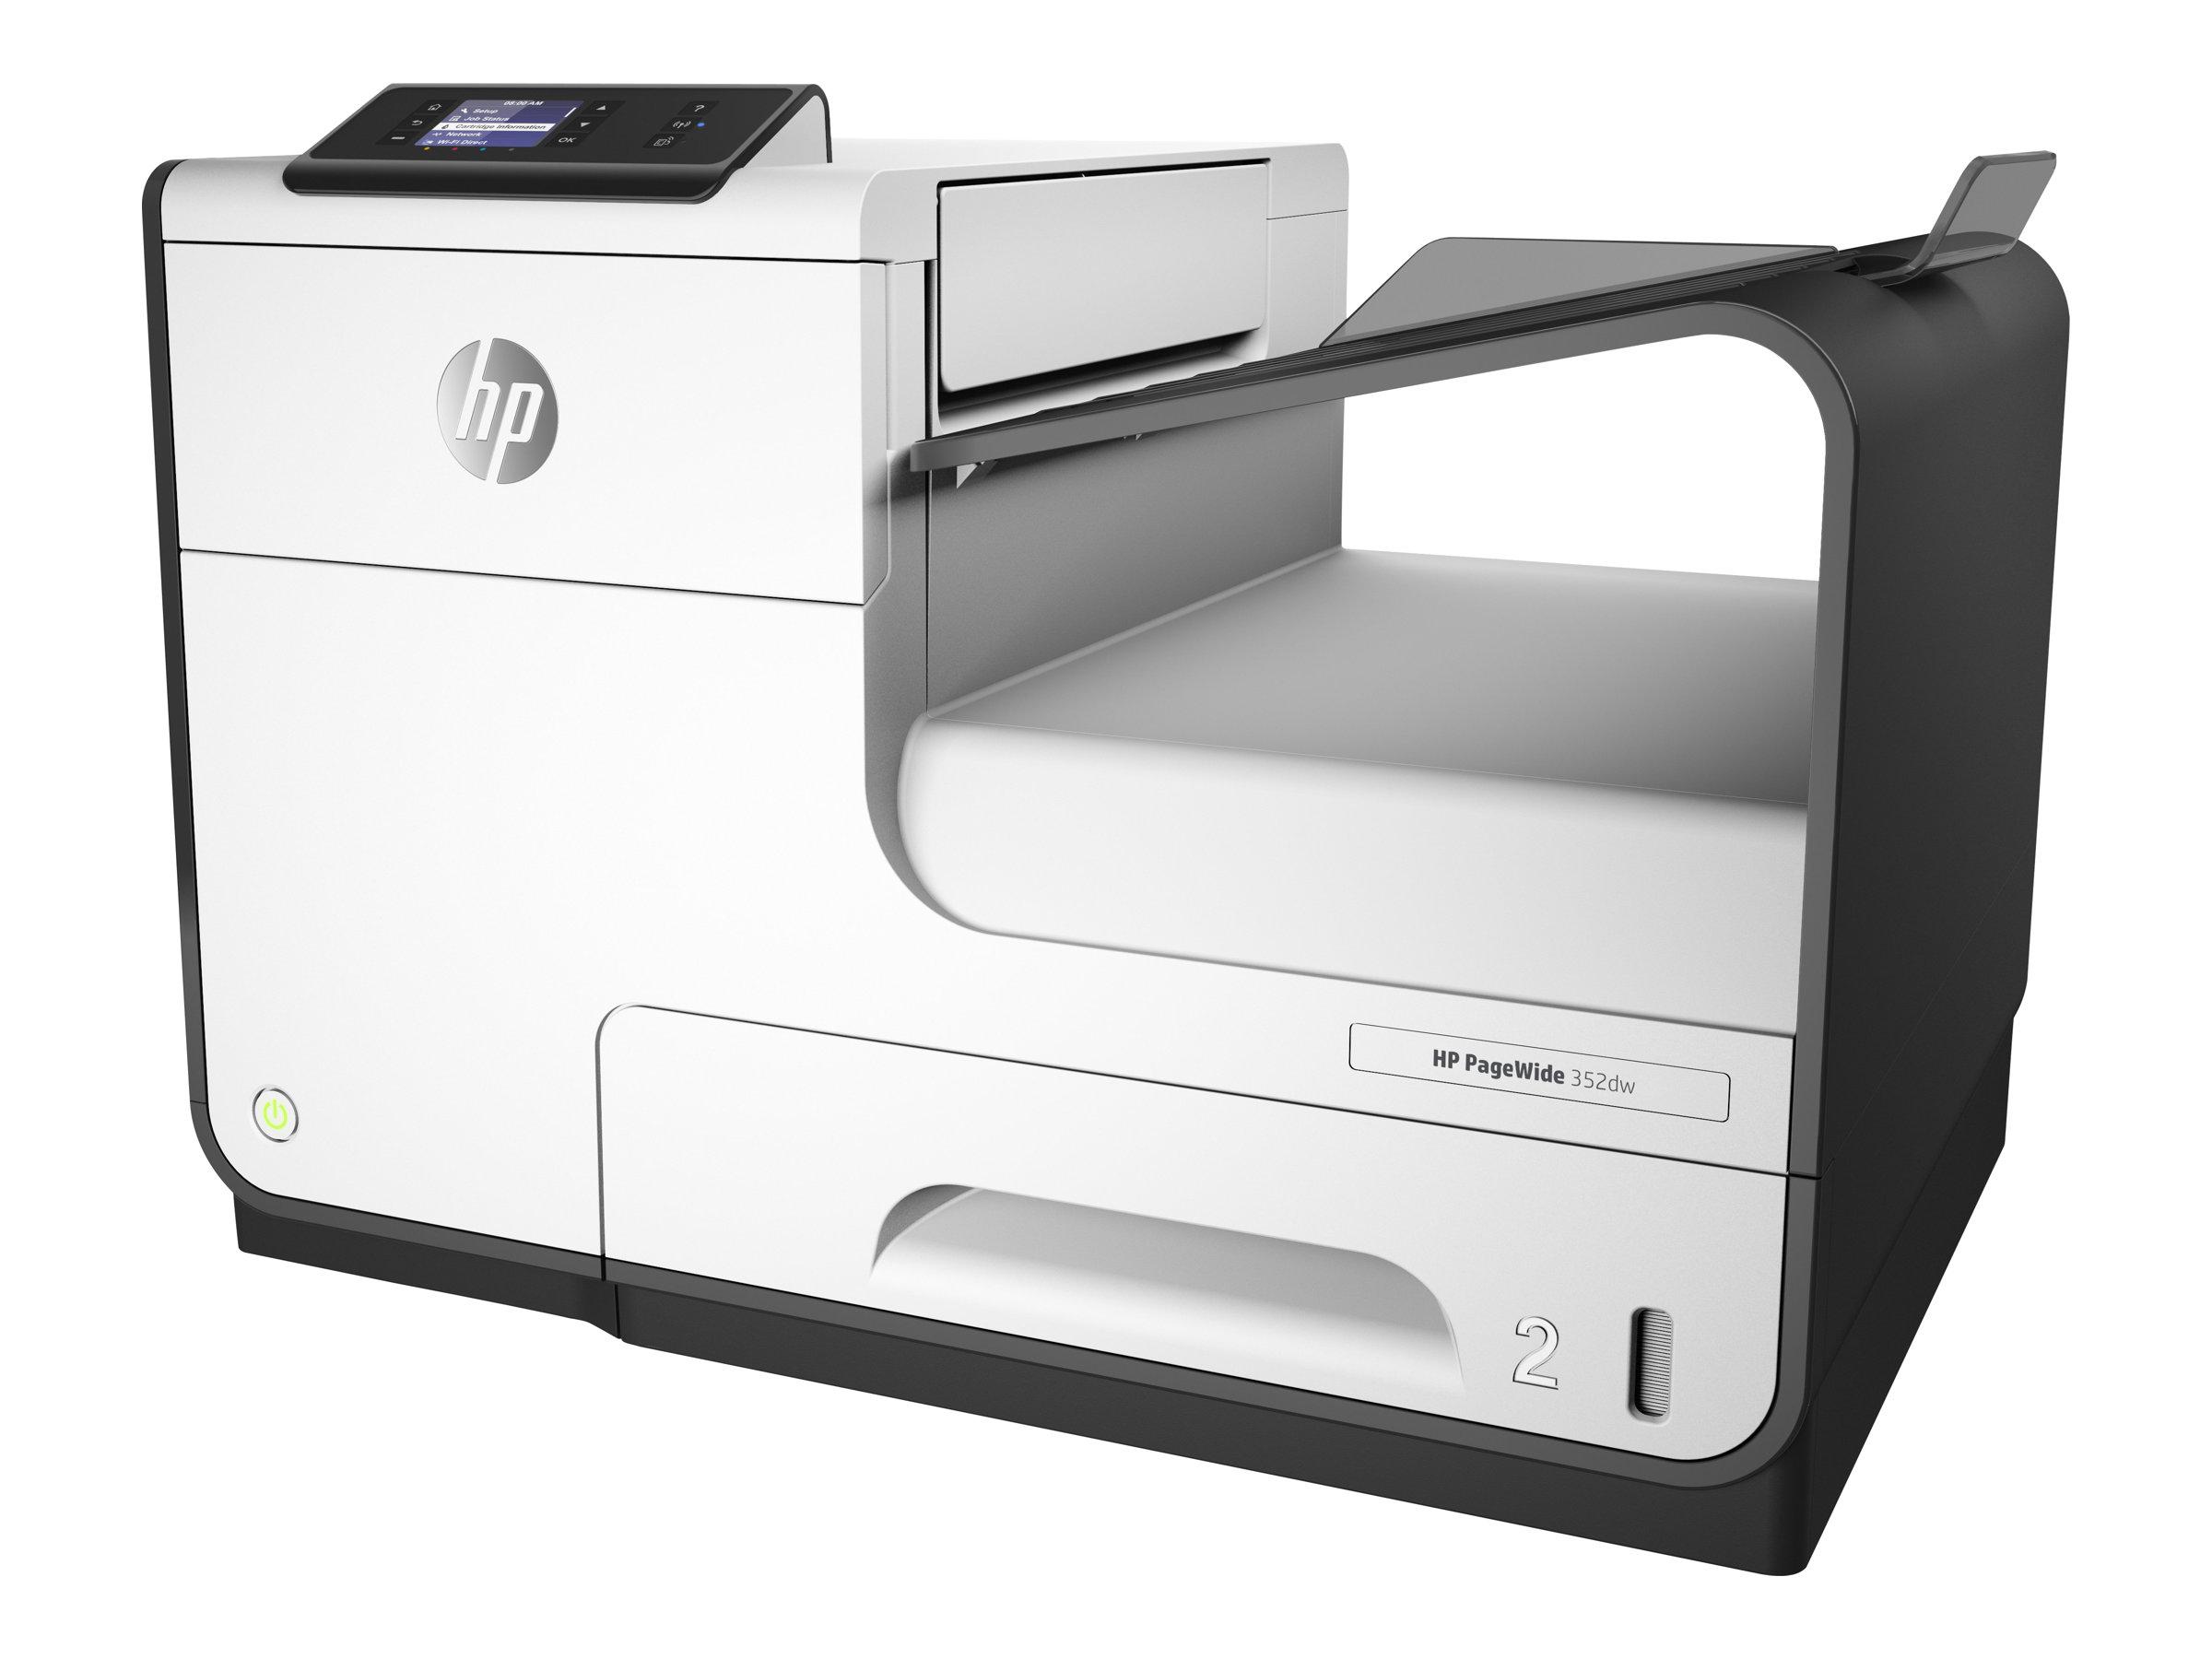 HP PageWide 352dw - Drucker - Farbe